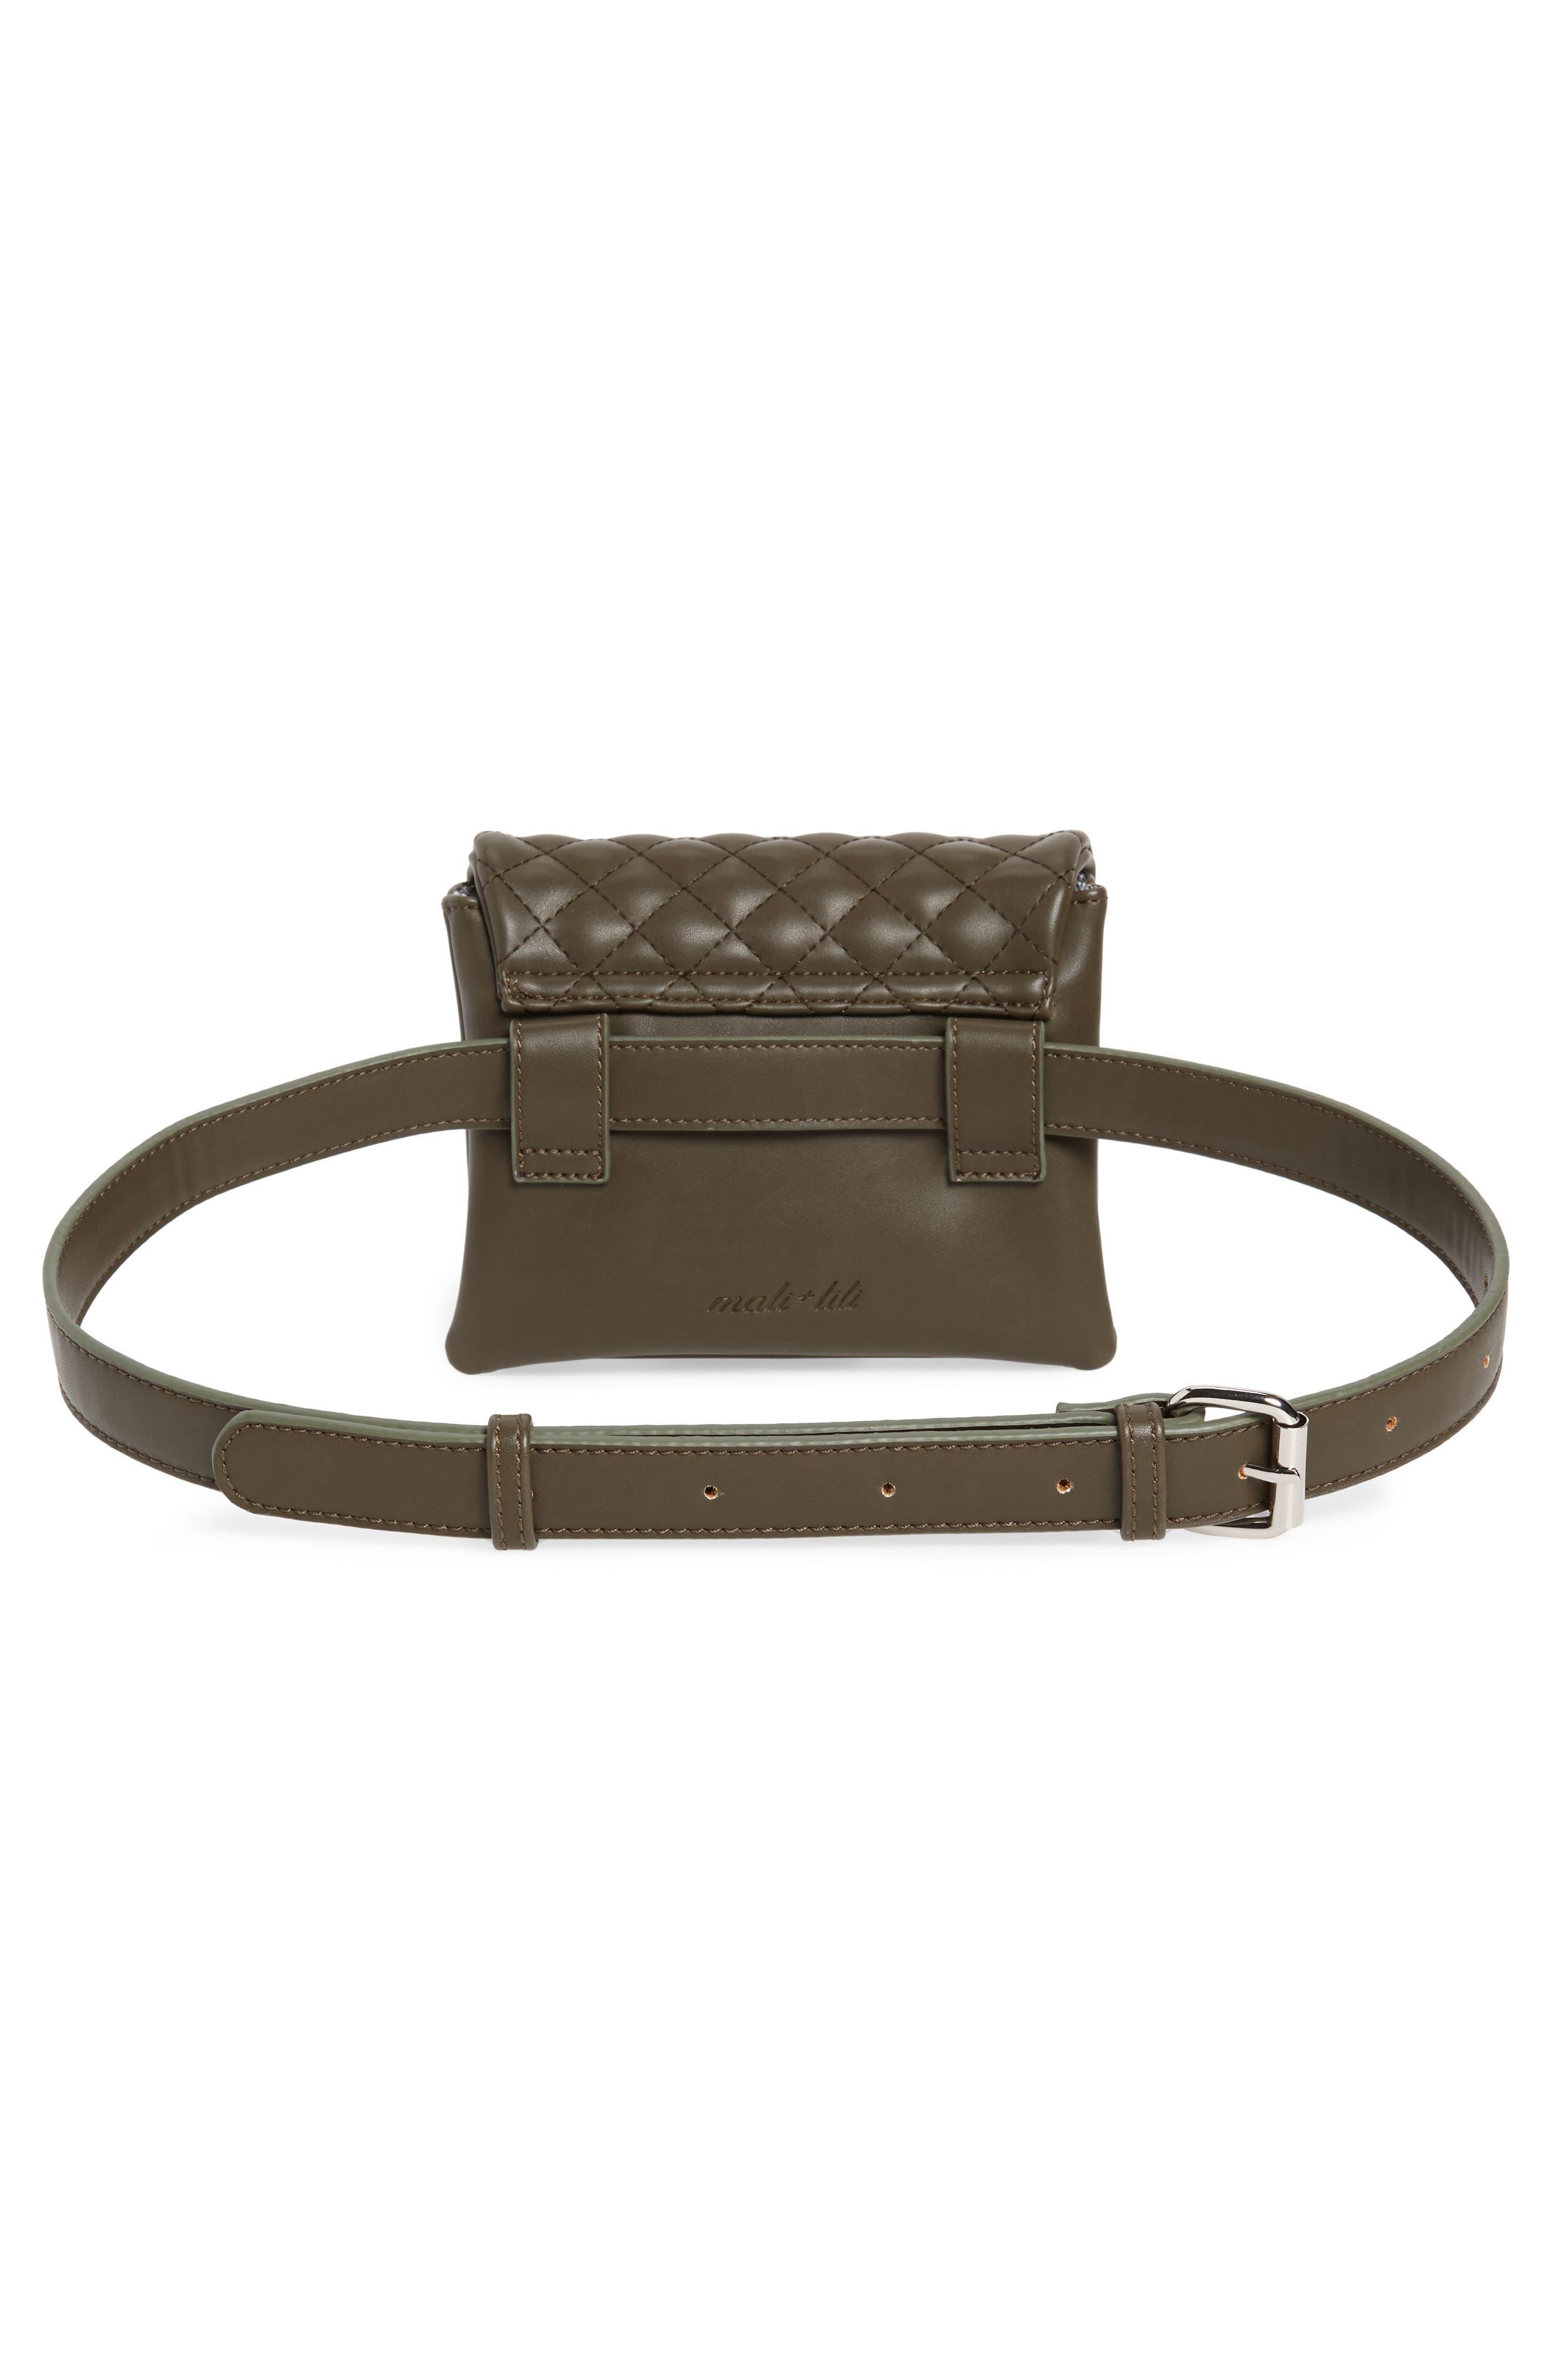 Mali + Lili Quilted Vegan Leather Convertible Belt Bag,                             Alternate thumbnail 5, color,                             OLIVE